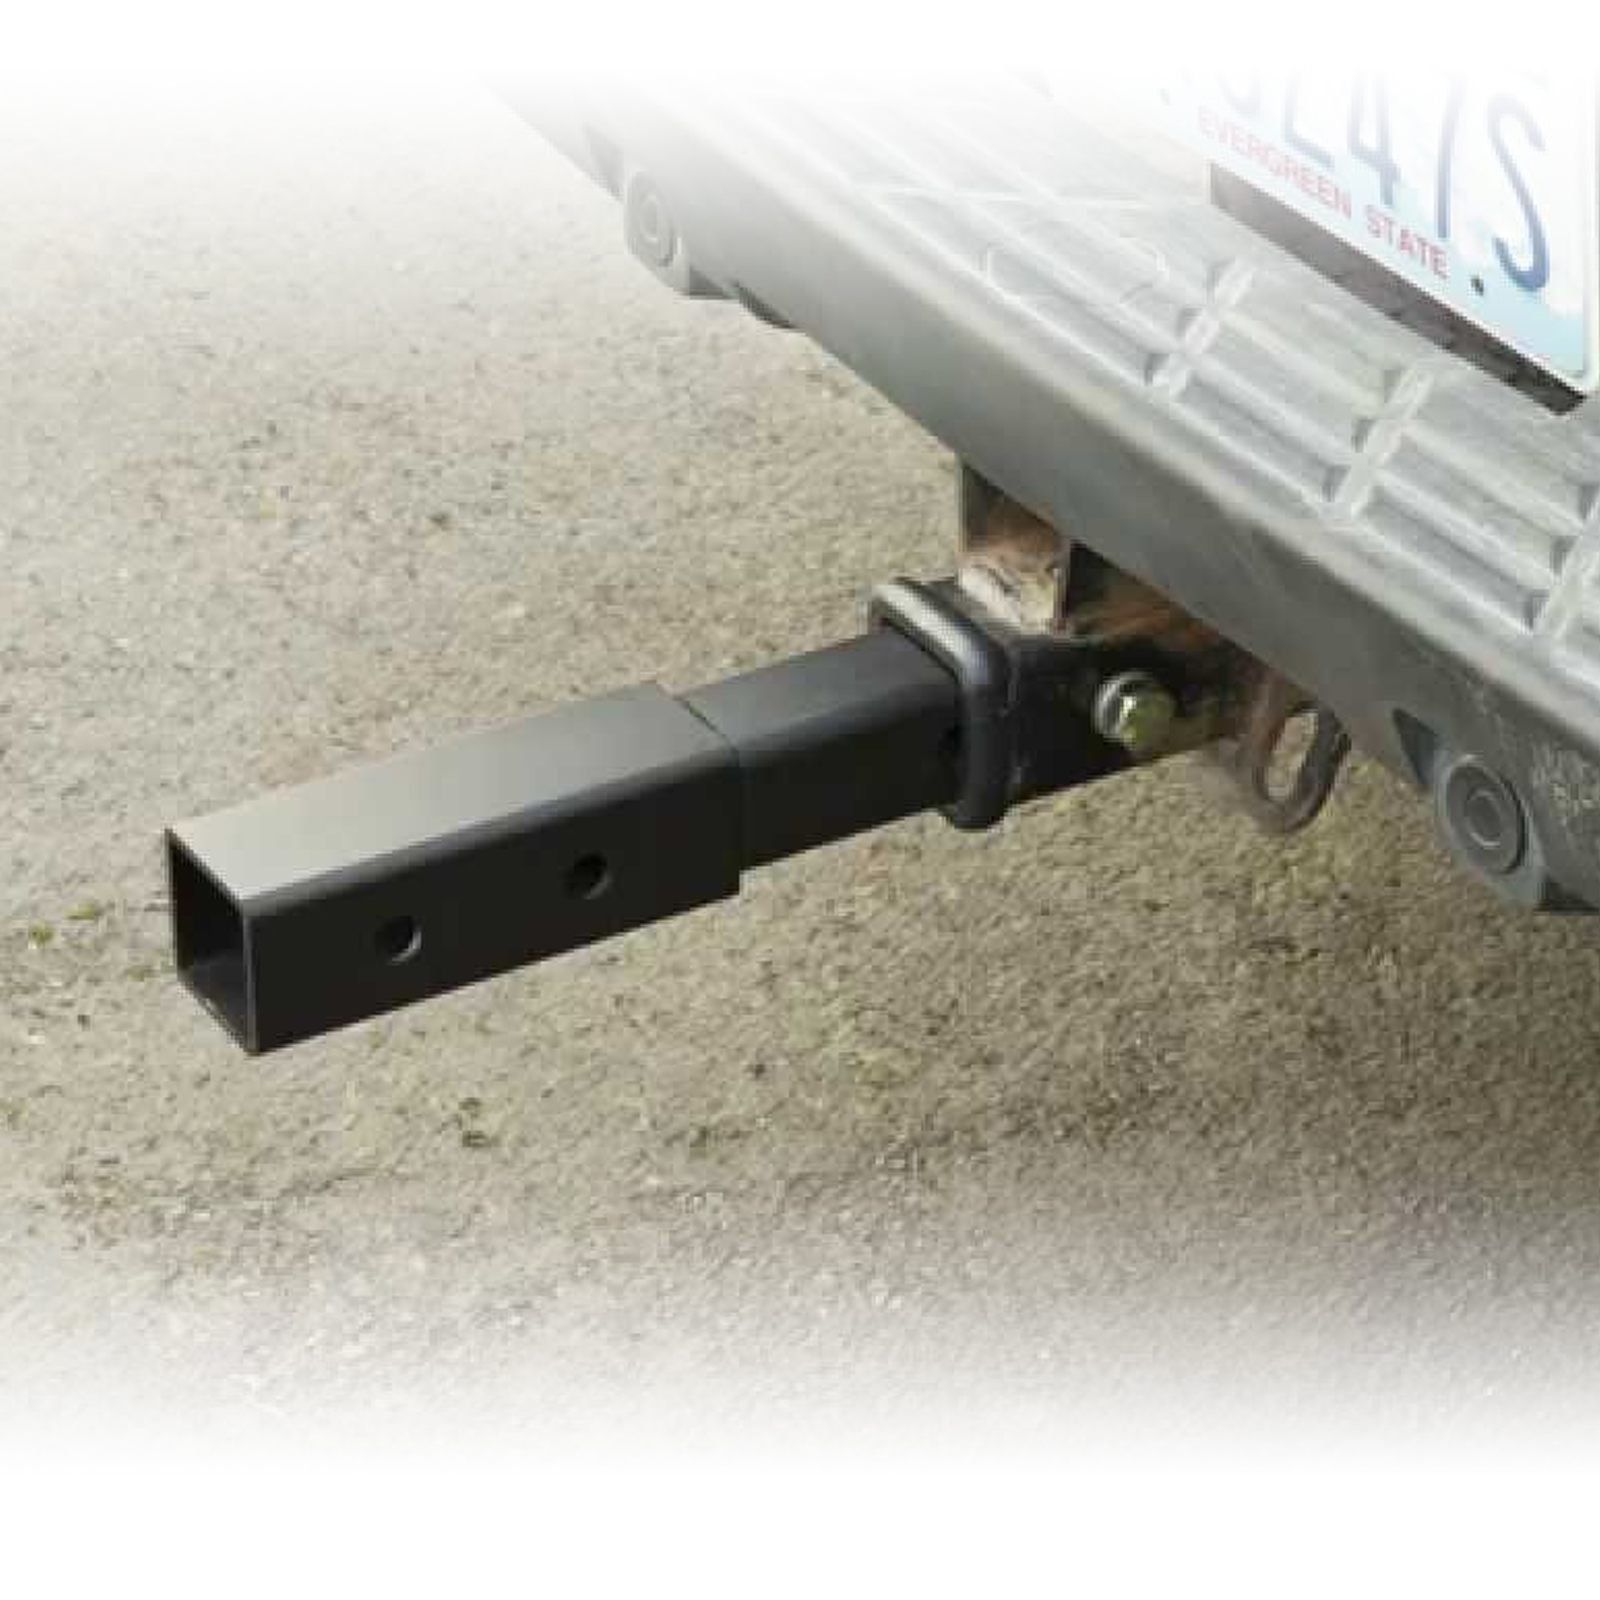 Heininger 6000 Advantage Adjustable 11 Inch Hitch Extension